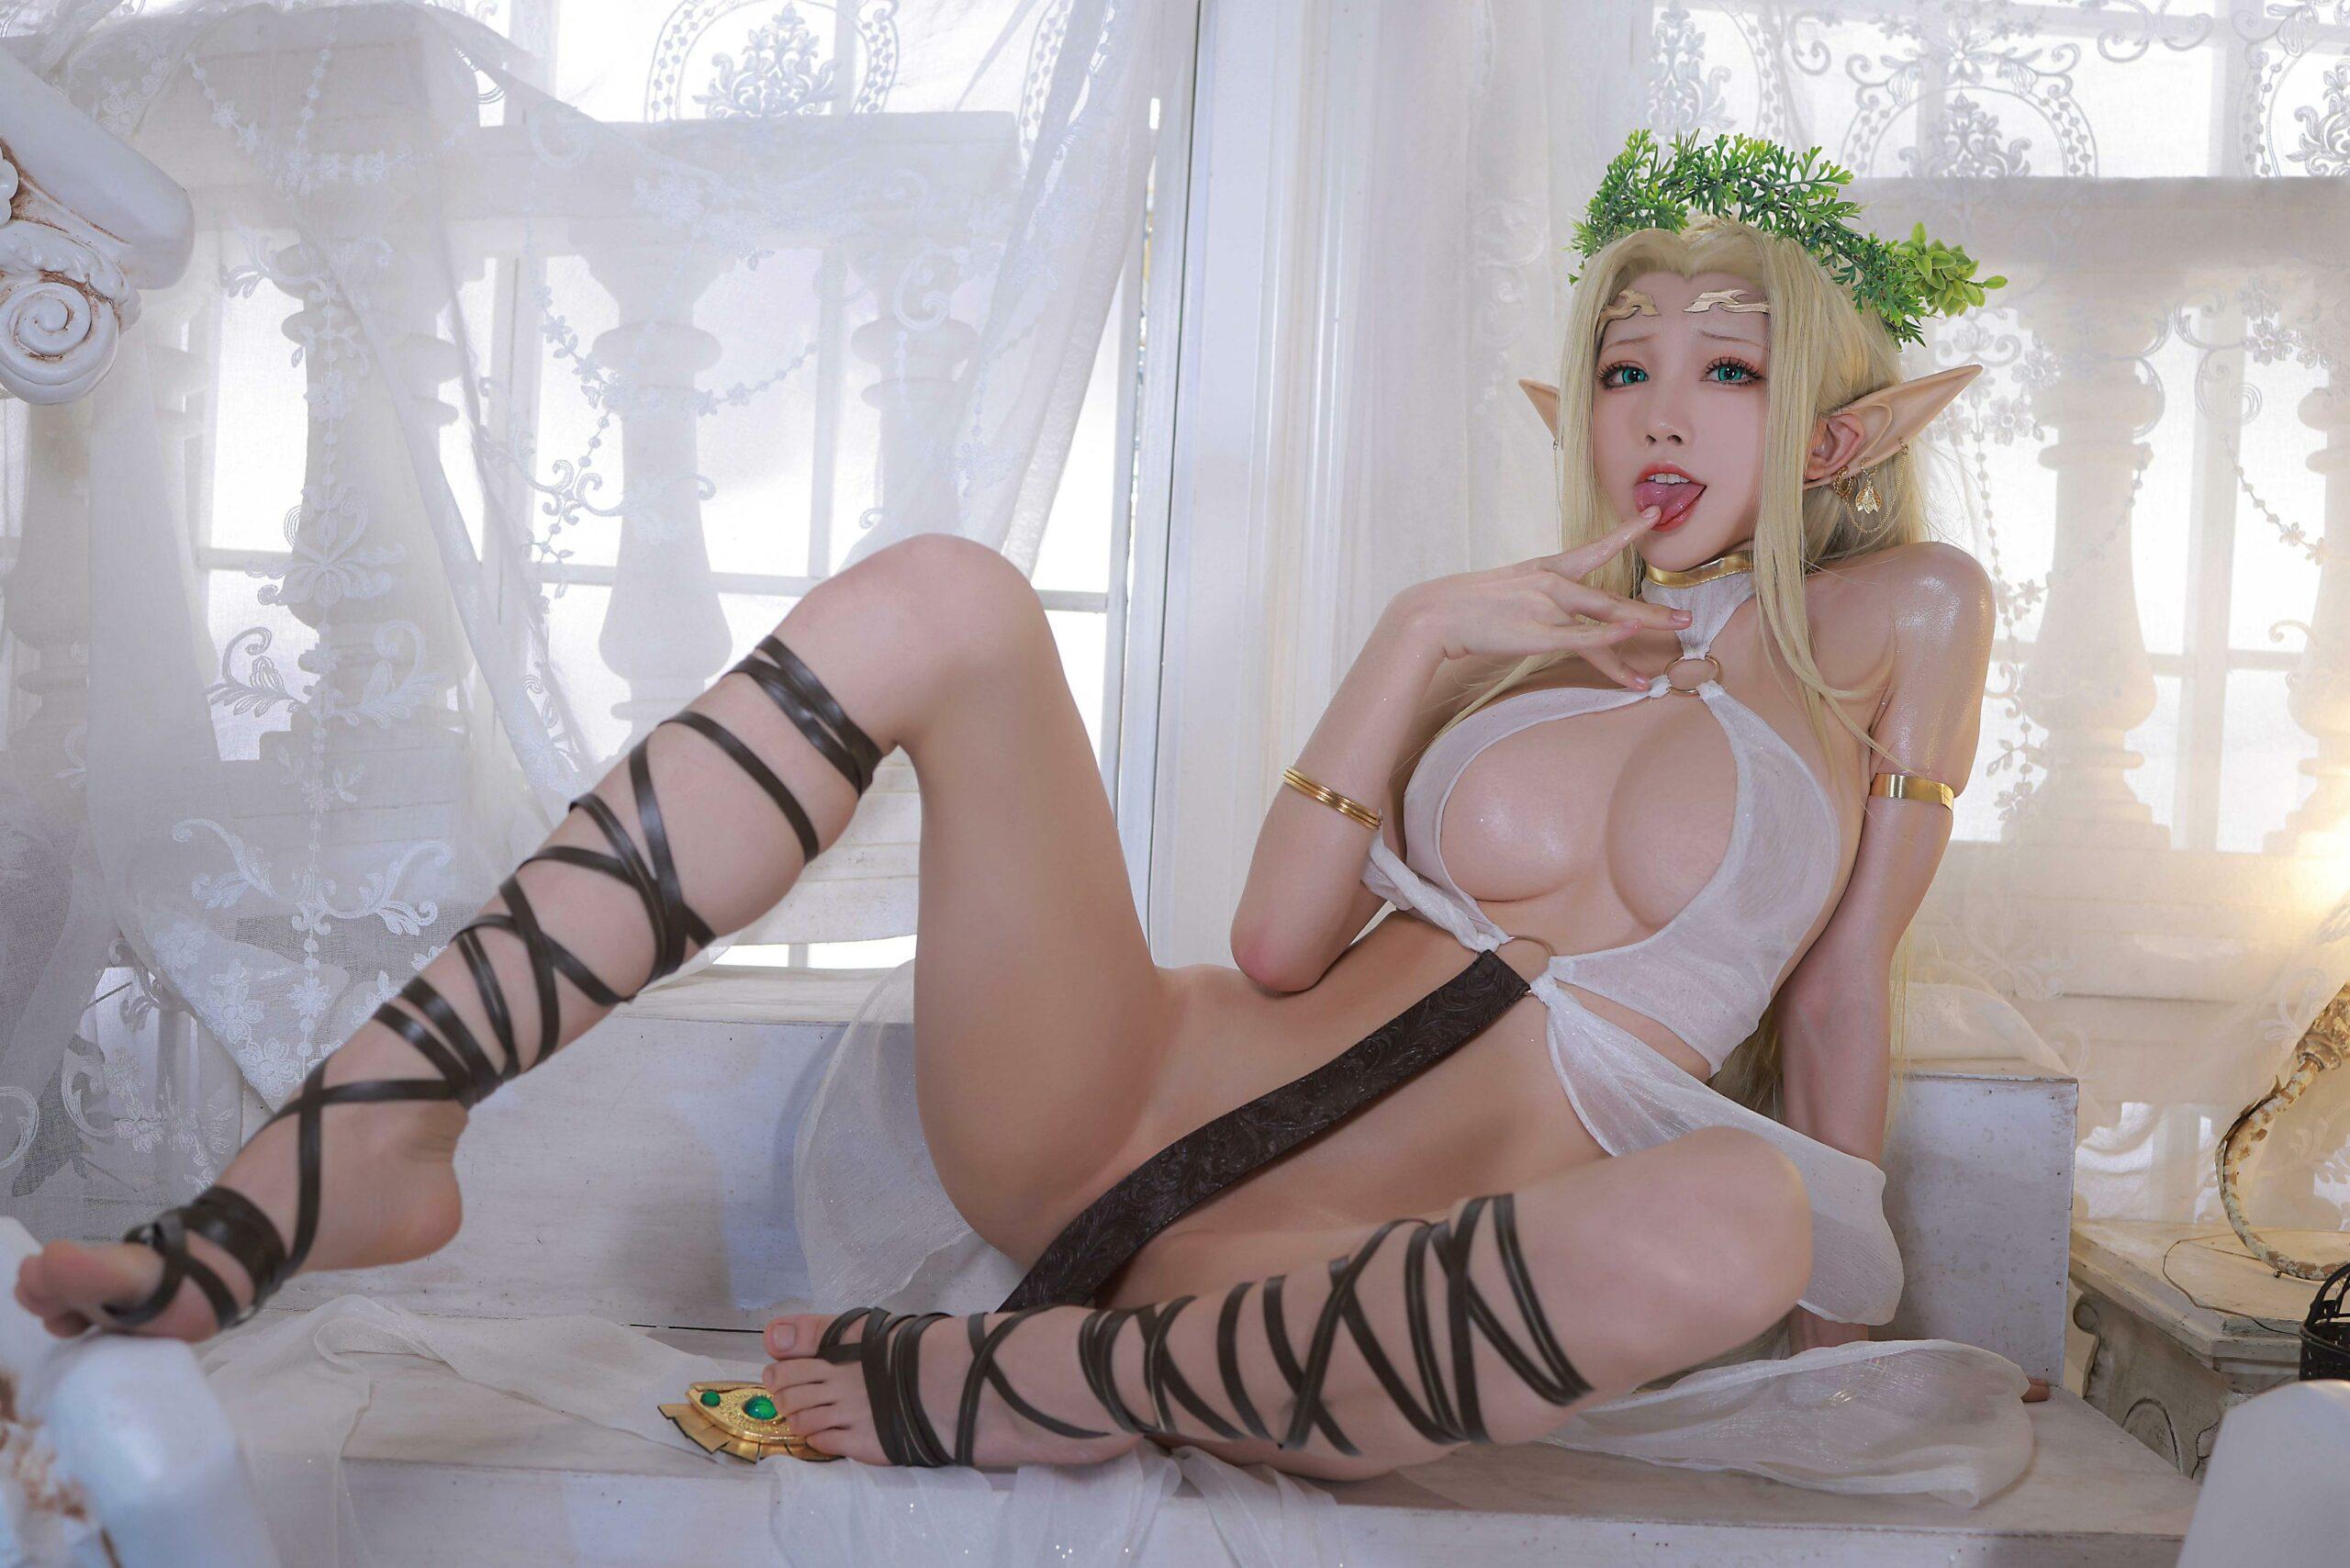 Kuroinu Celestine Cosplay by Aqua 10